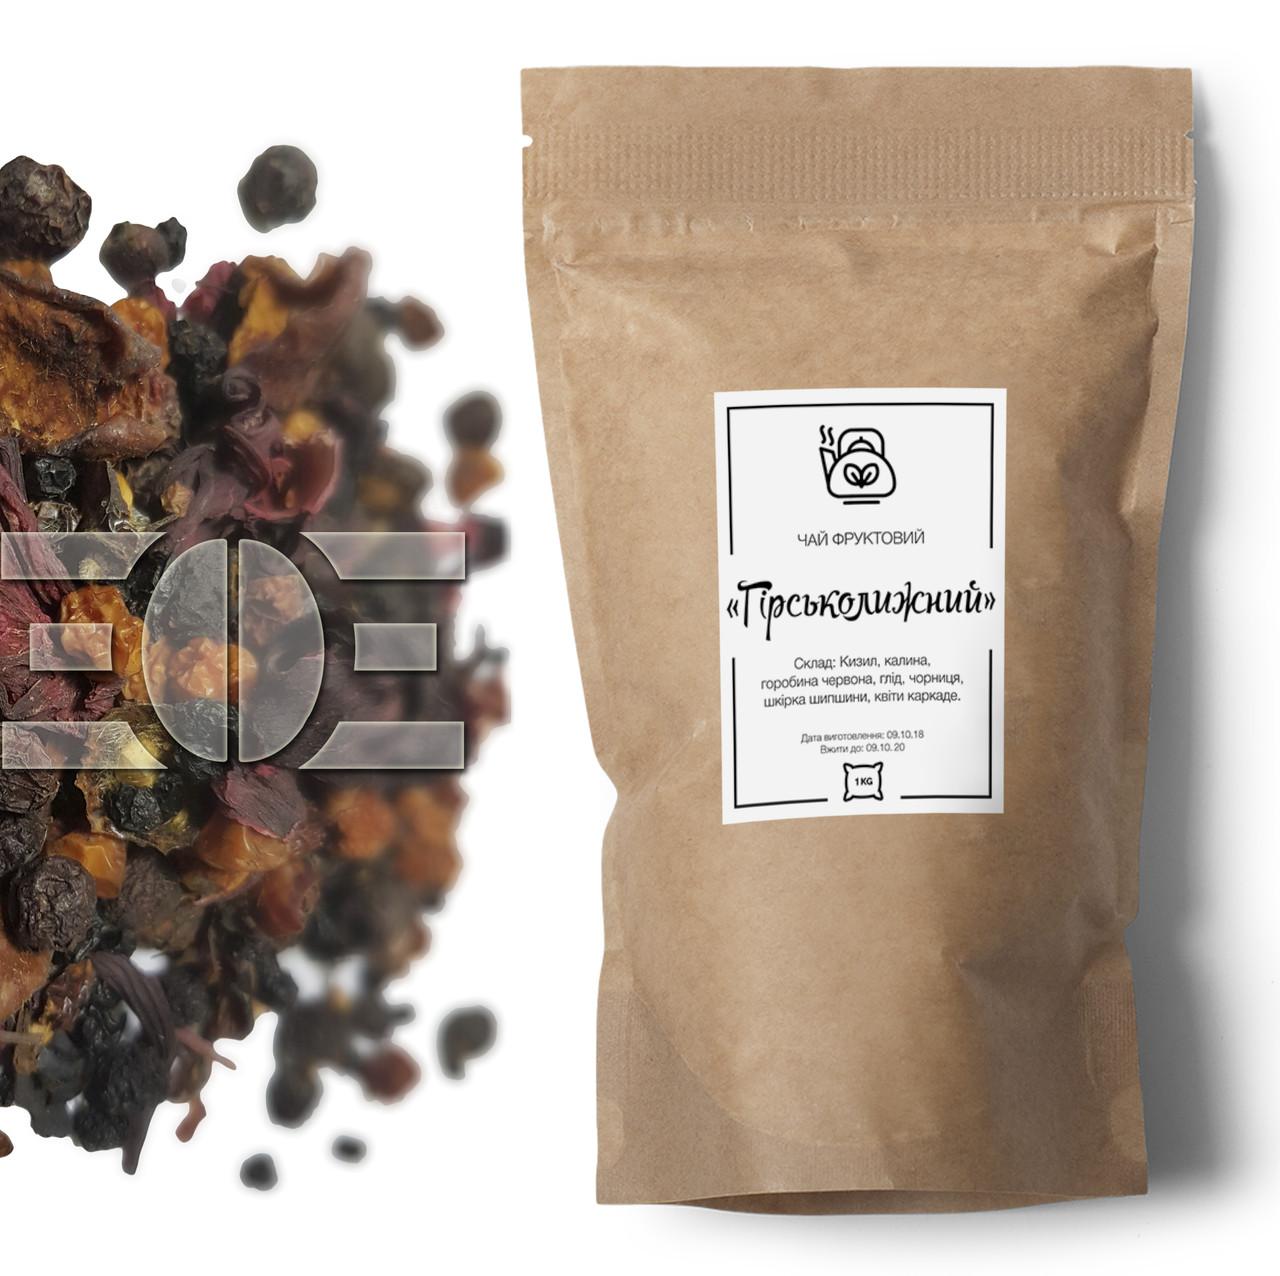 "Чай фруктовый ""ГІРСЬКОЛИЖНИЙ"", 1кг"